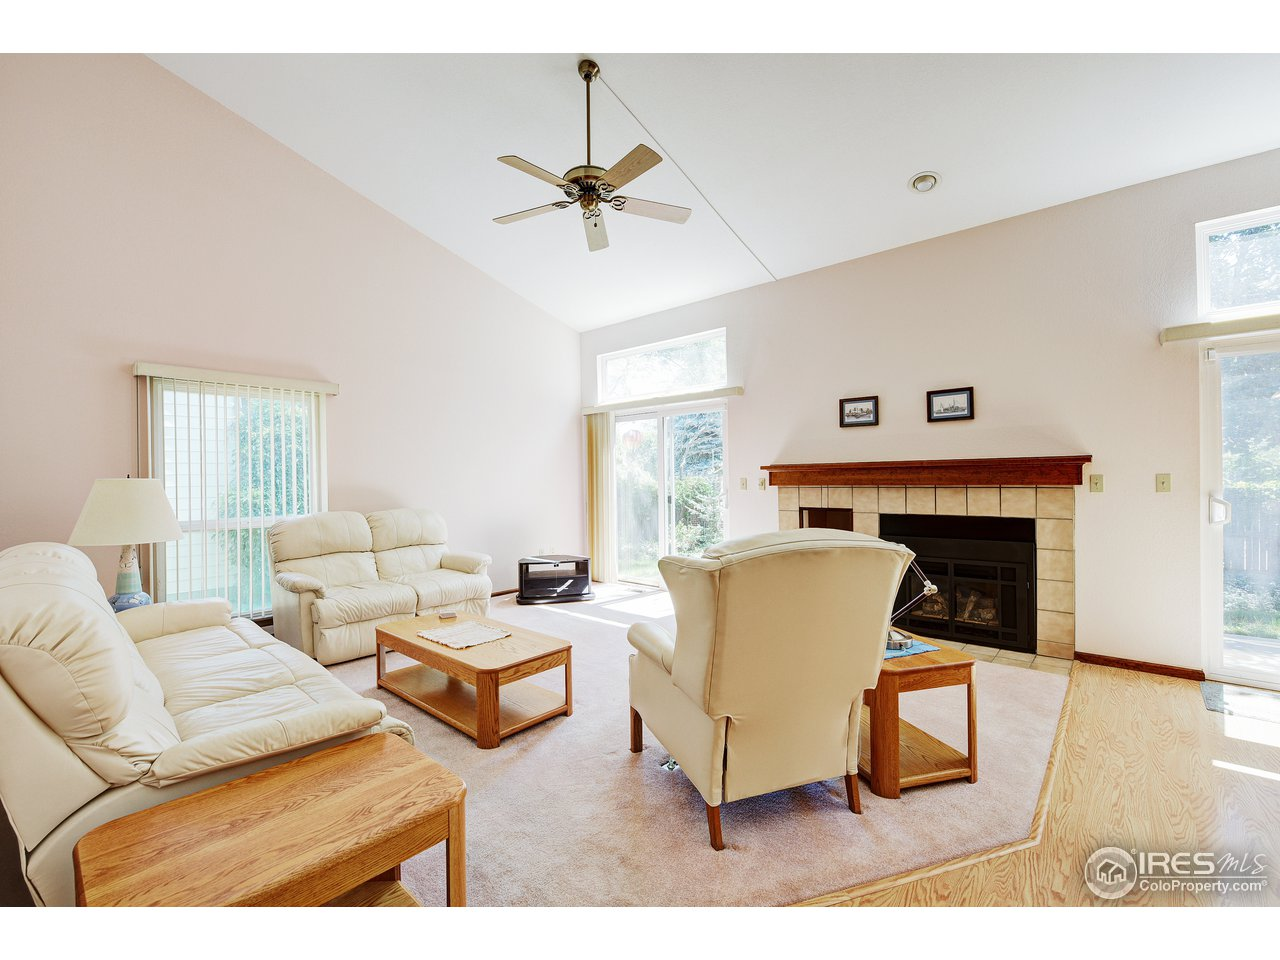 Living room opens onto backyard patio